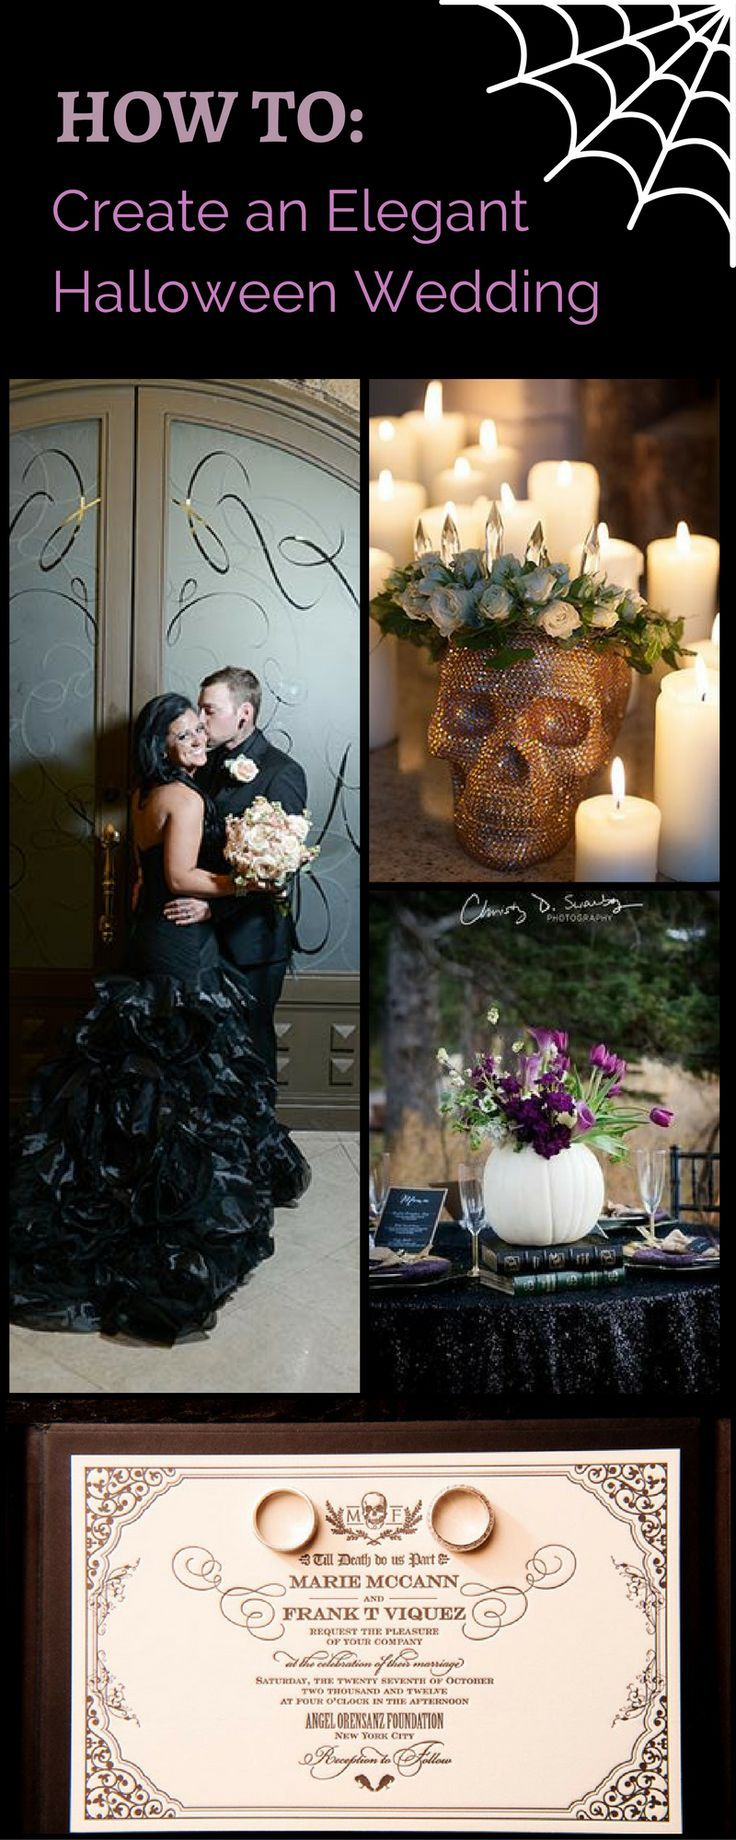 ef5b559122 Classy Halloween Wedding Ideas | Wedding Ideas | Classy halloween ...